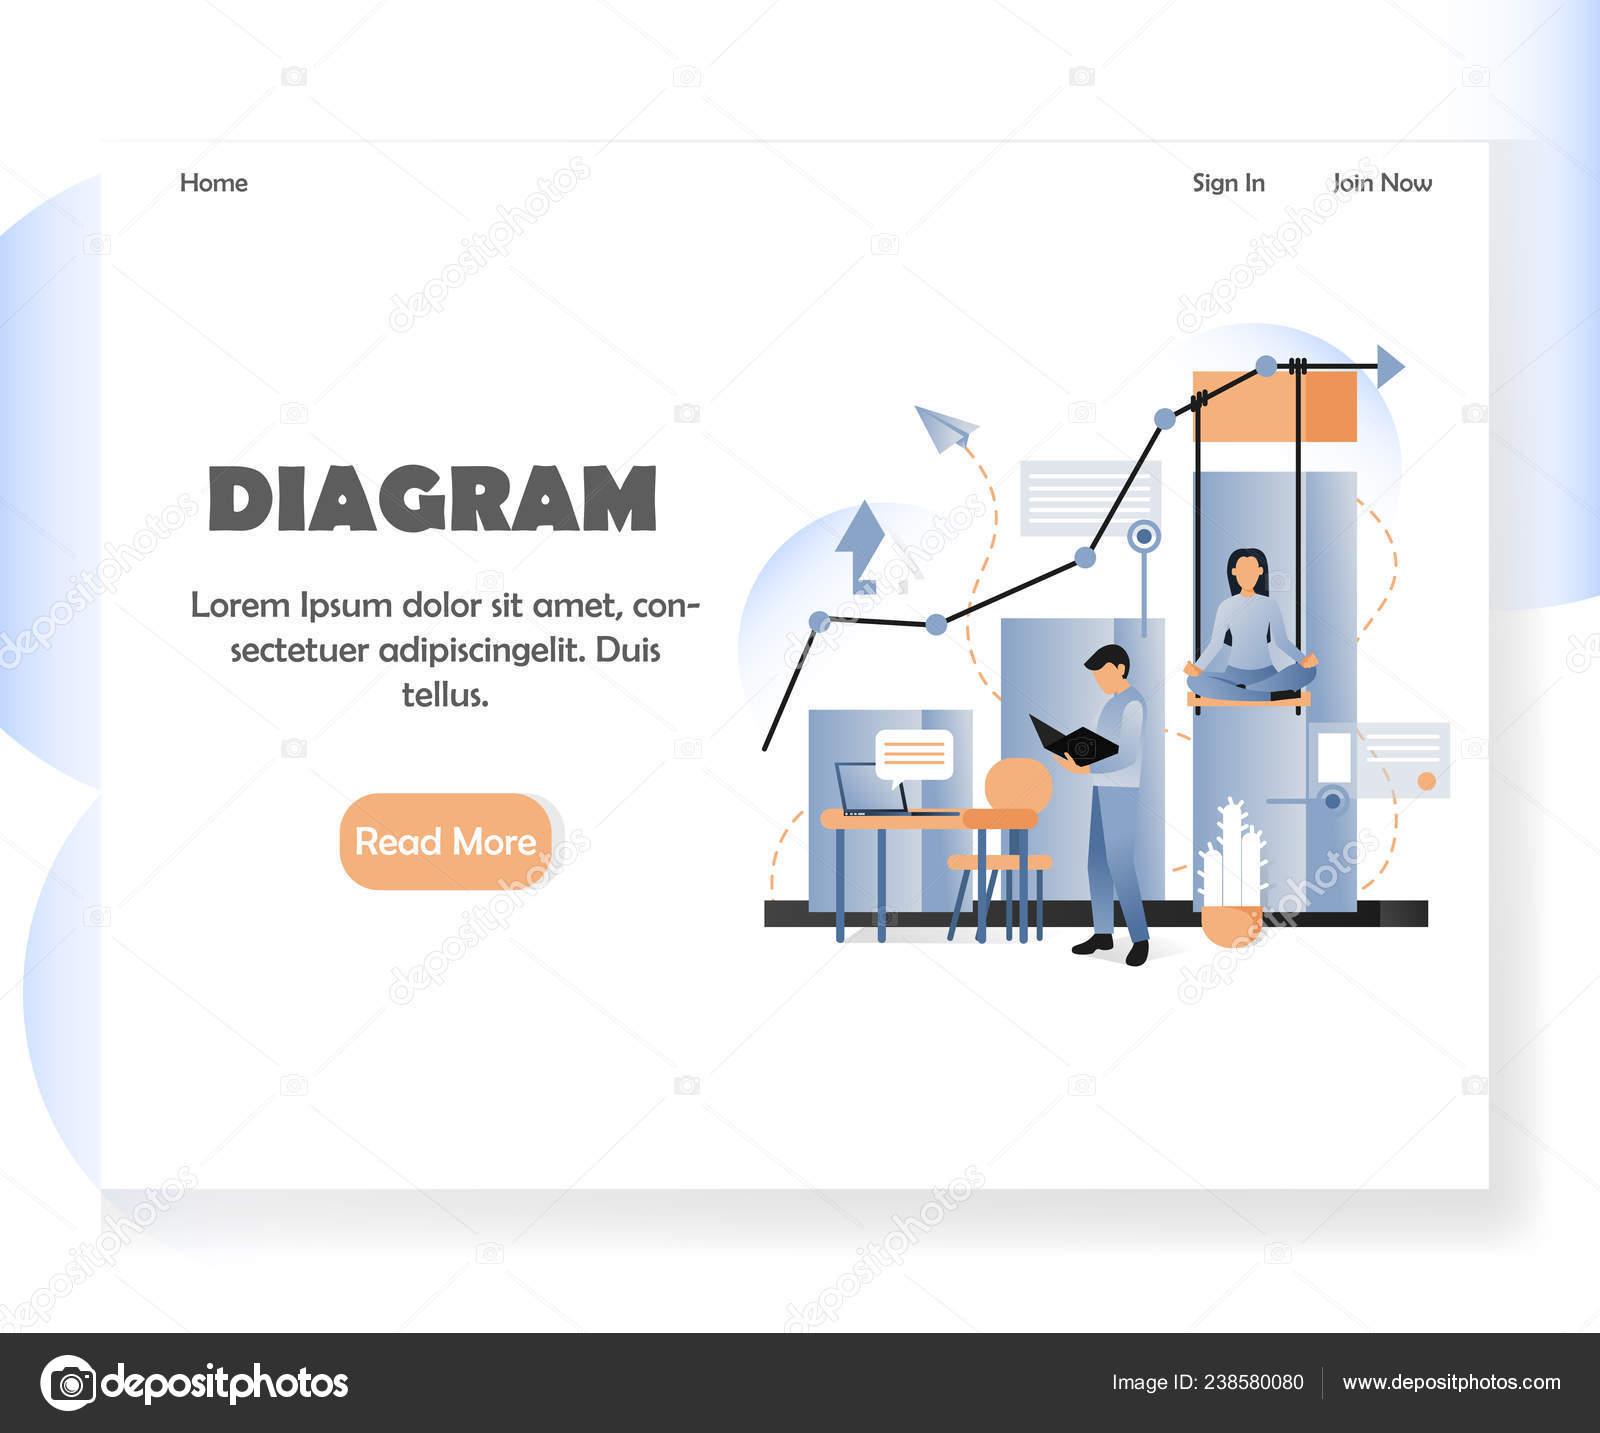 hight resolution of business diagram vector website landing page design template stock illustration